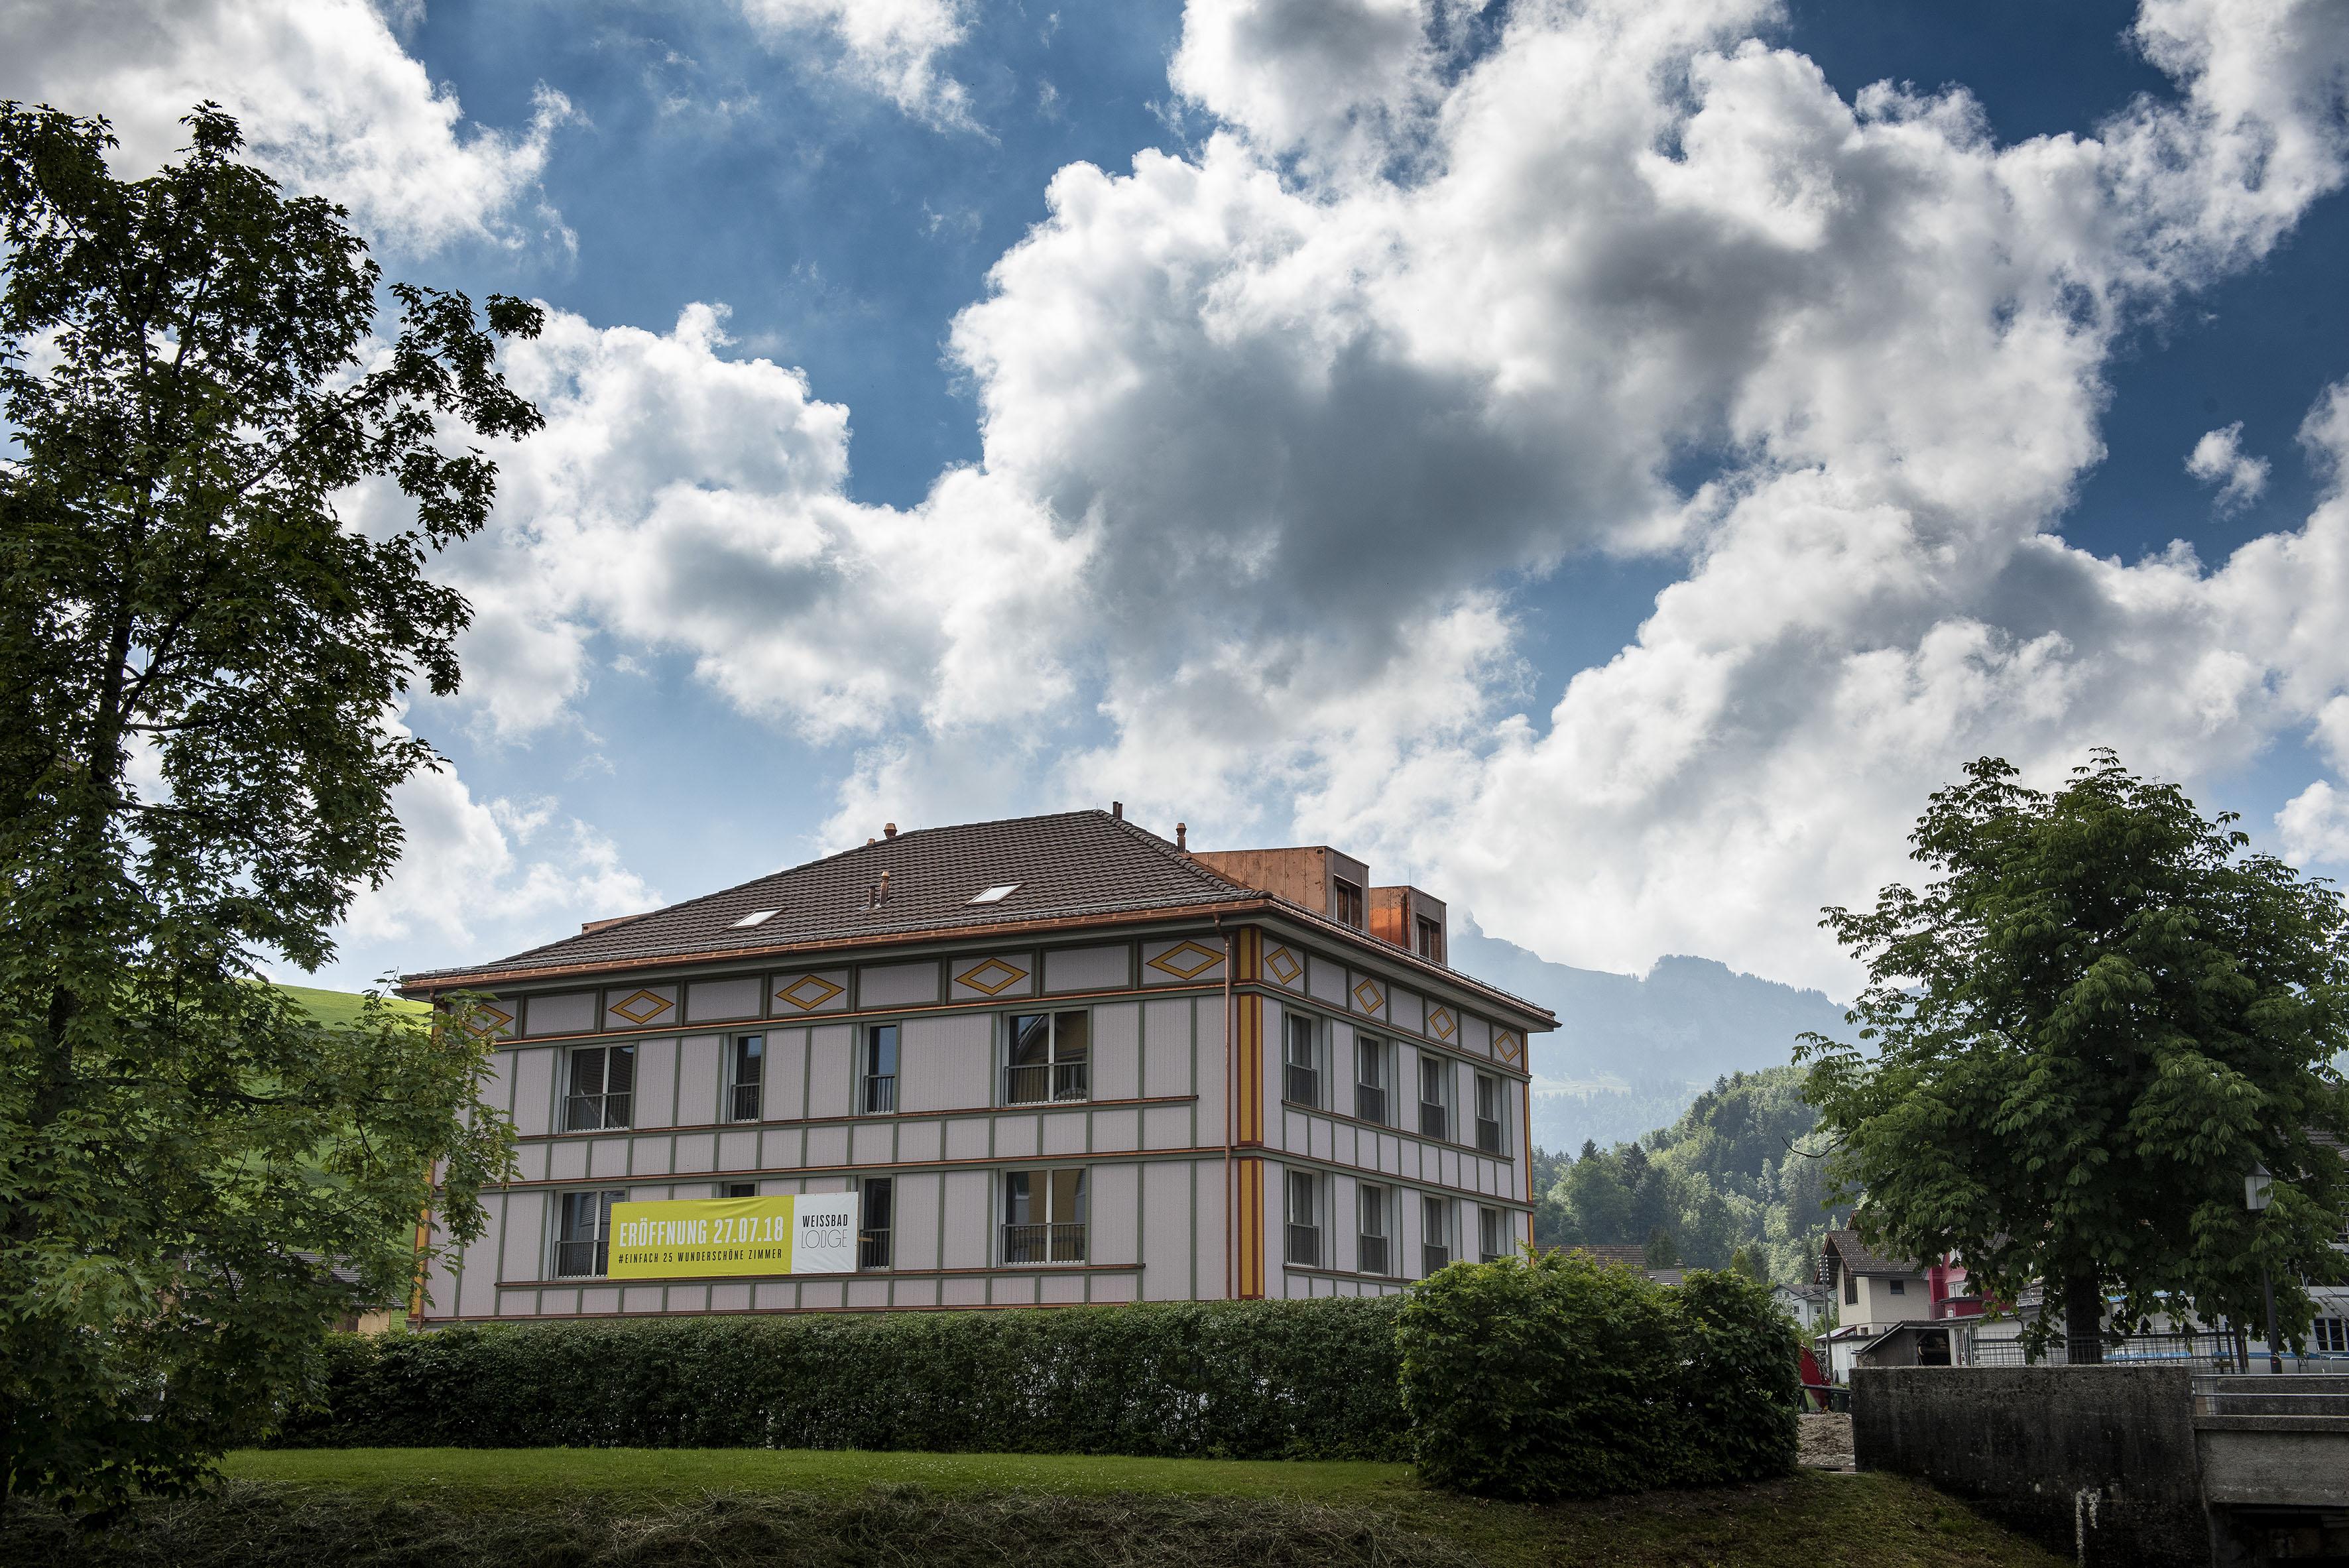 swisshoteldata.ch - Swiss hotel directory